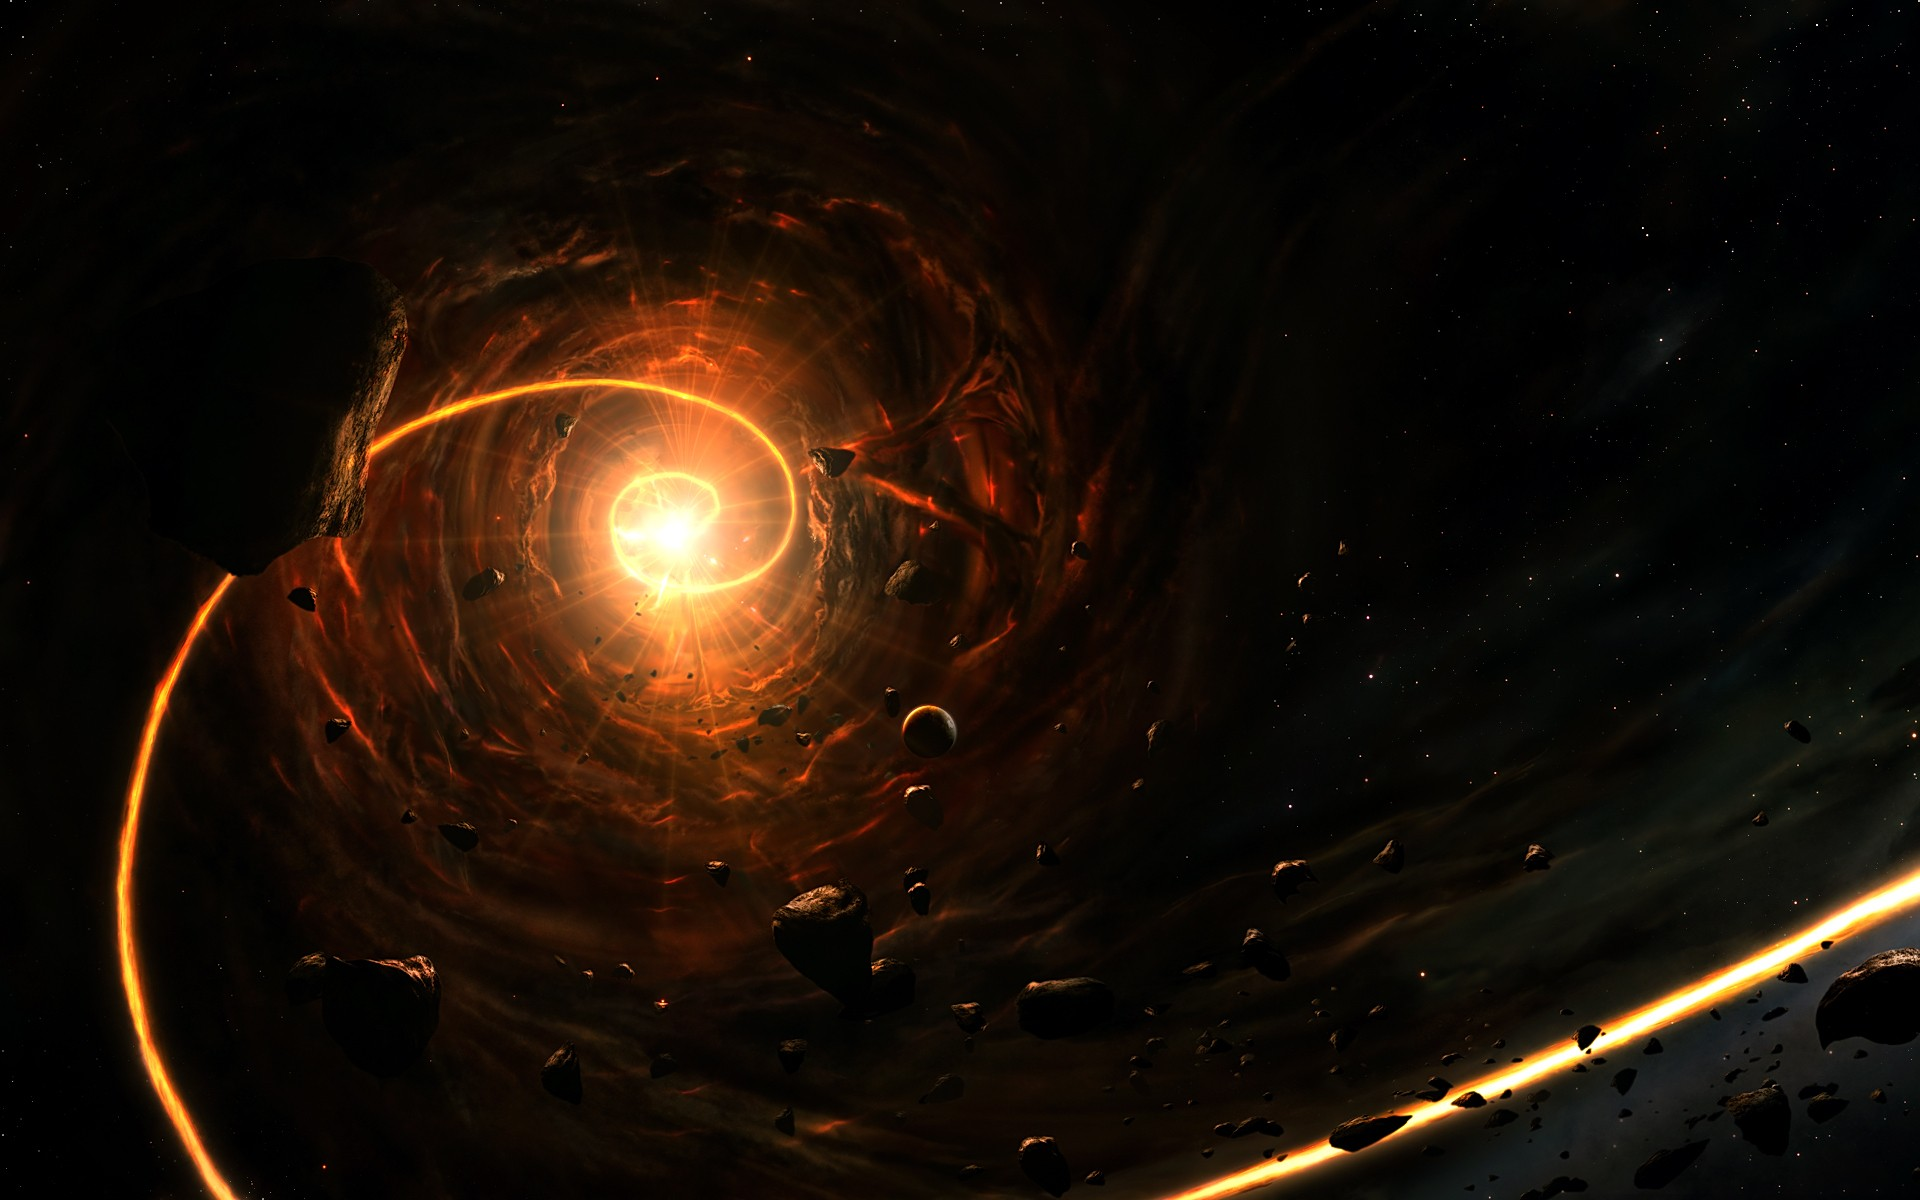 General 1920x1200 space space art black holes